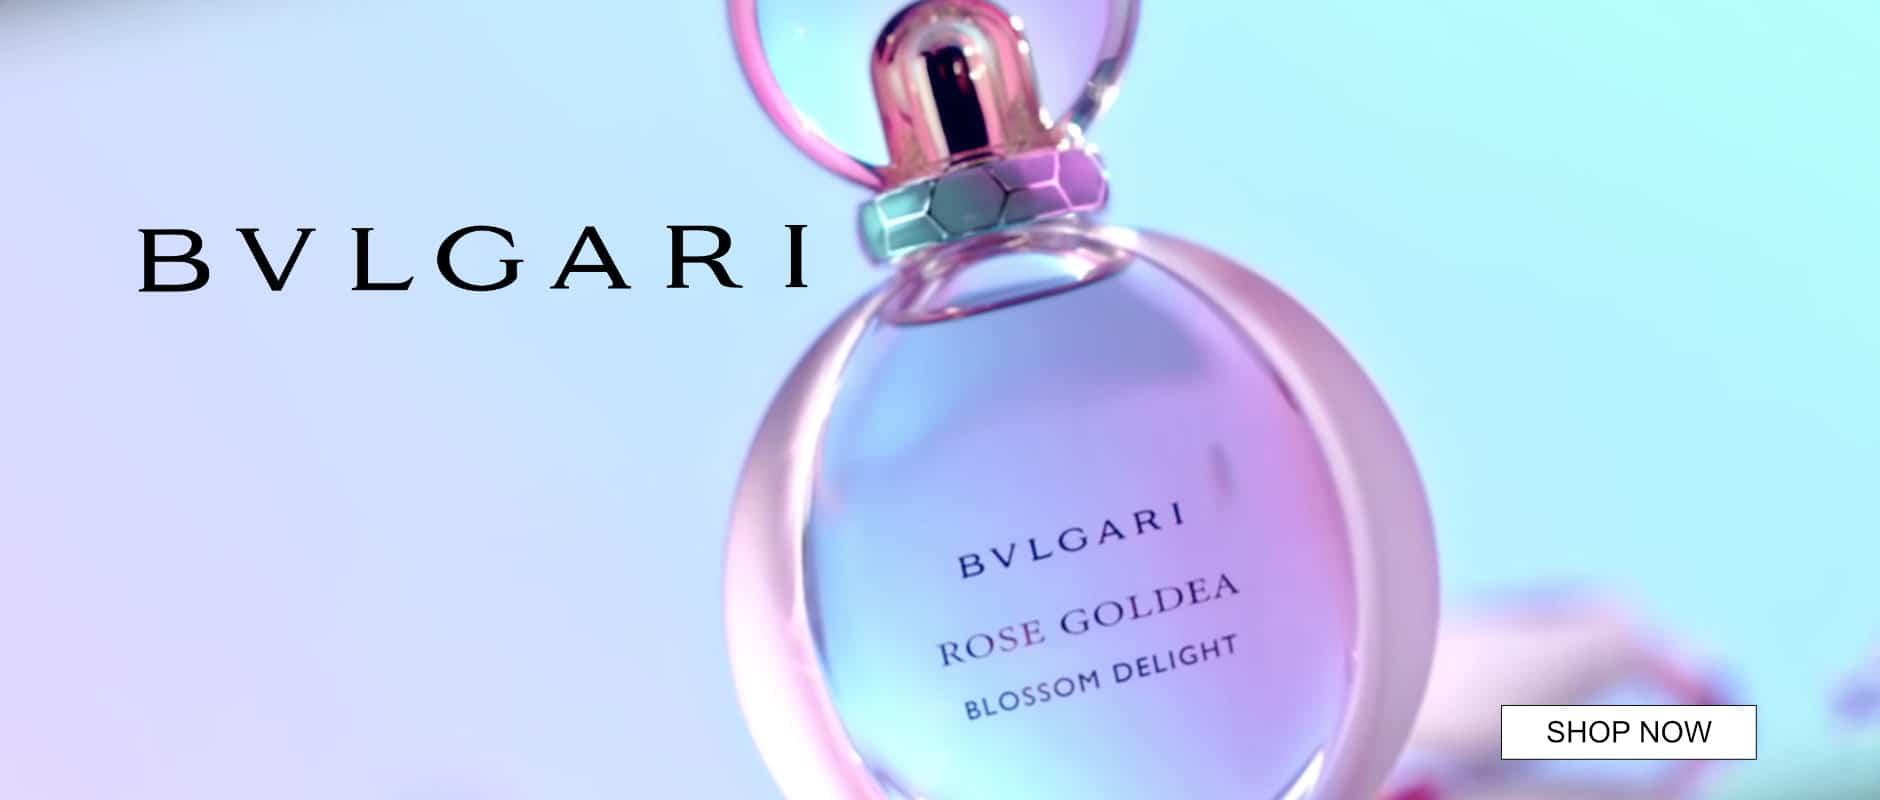 Bvlgari Rose Goldea Blossom Perfume